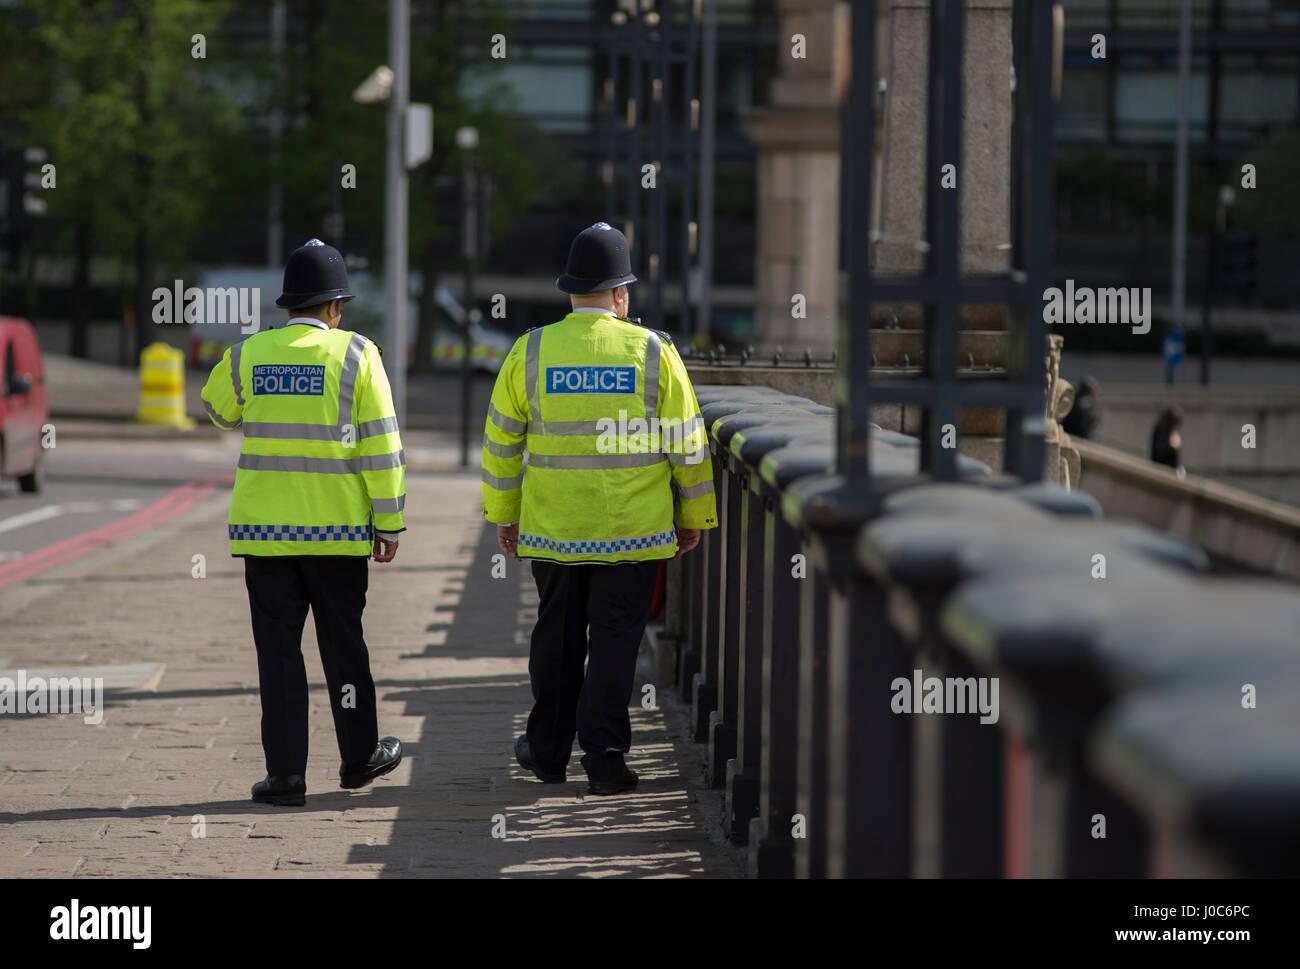 Metropolitan police officers walk along Lambeth Bridge in London wearing hi-viz vests. Credit: Malcolm Park - Stock Image